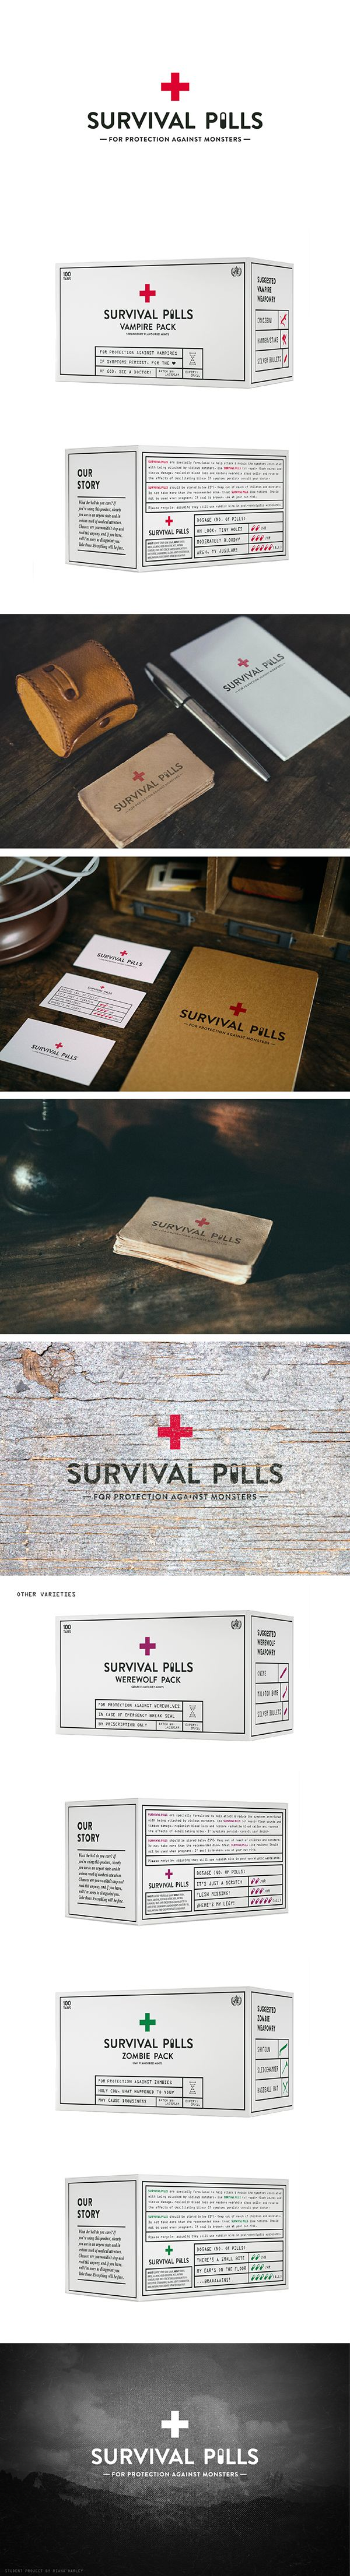 Survival Pills Packaging Concept on Behance.